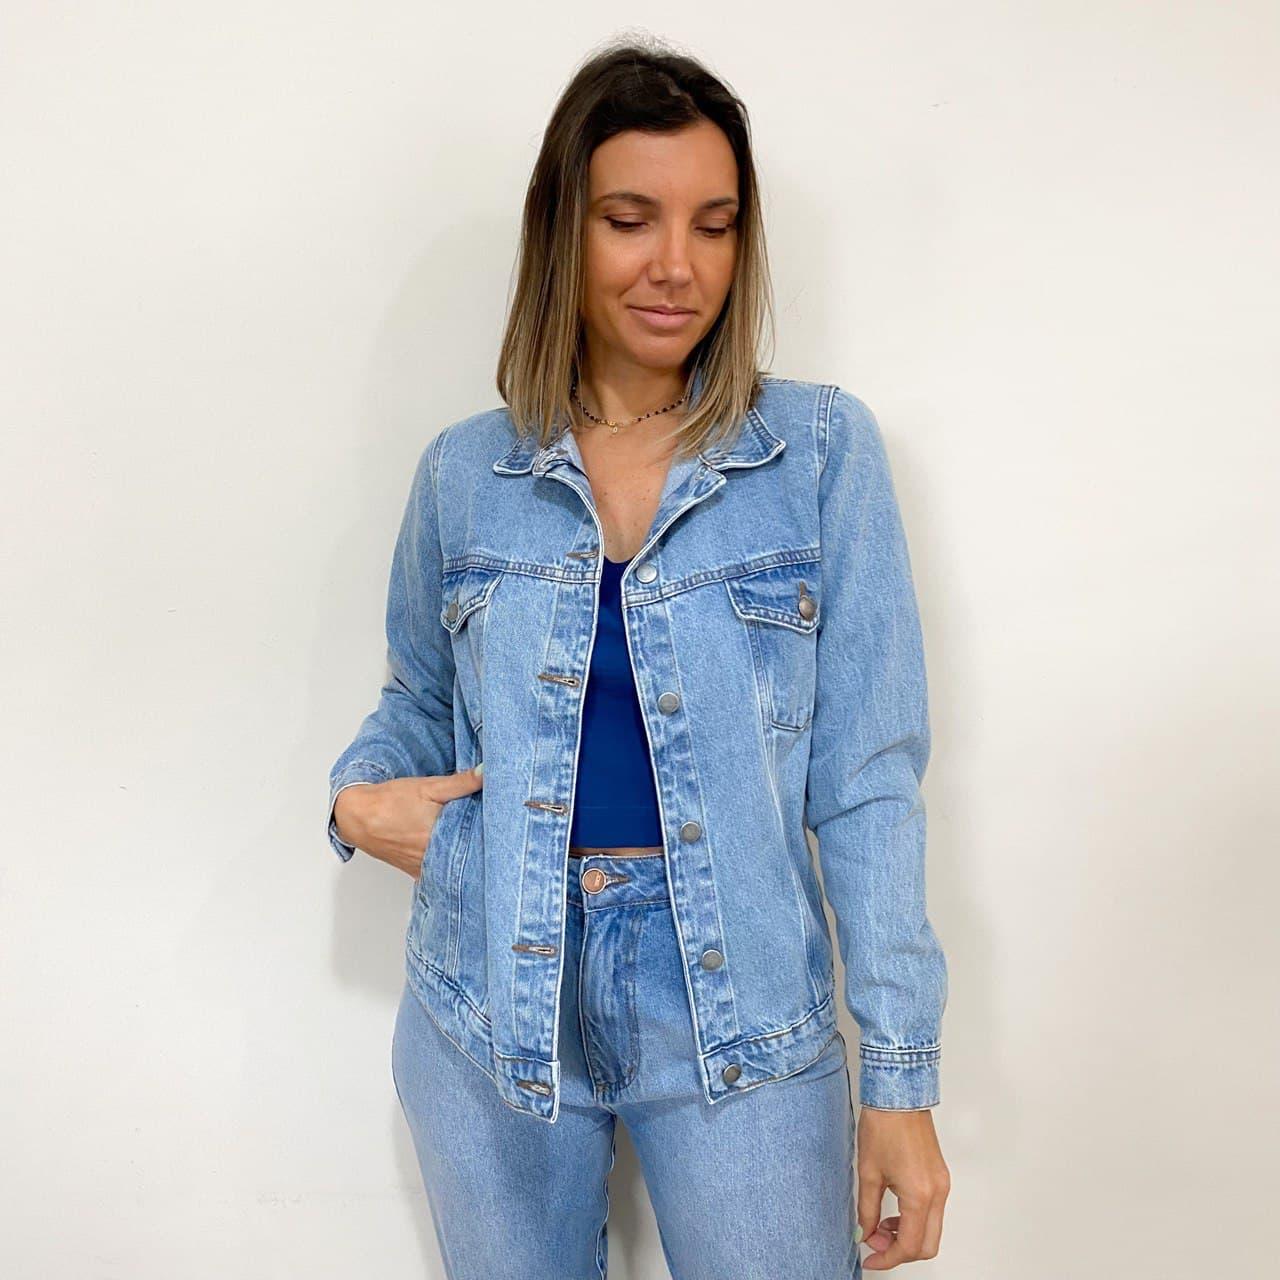 Jaqueta Jeans Classic - Azul Claro